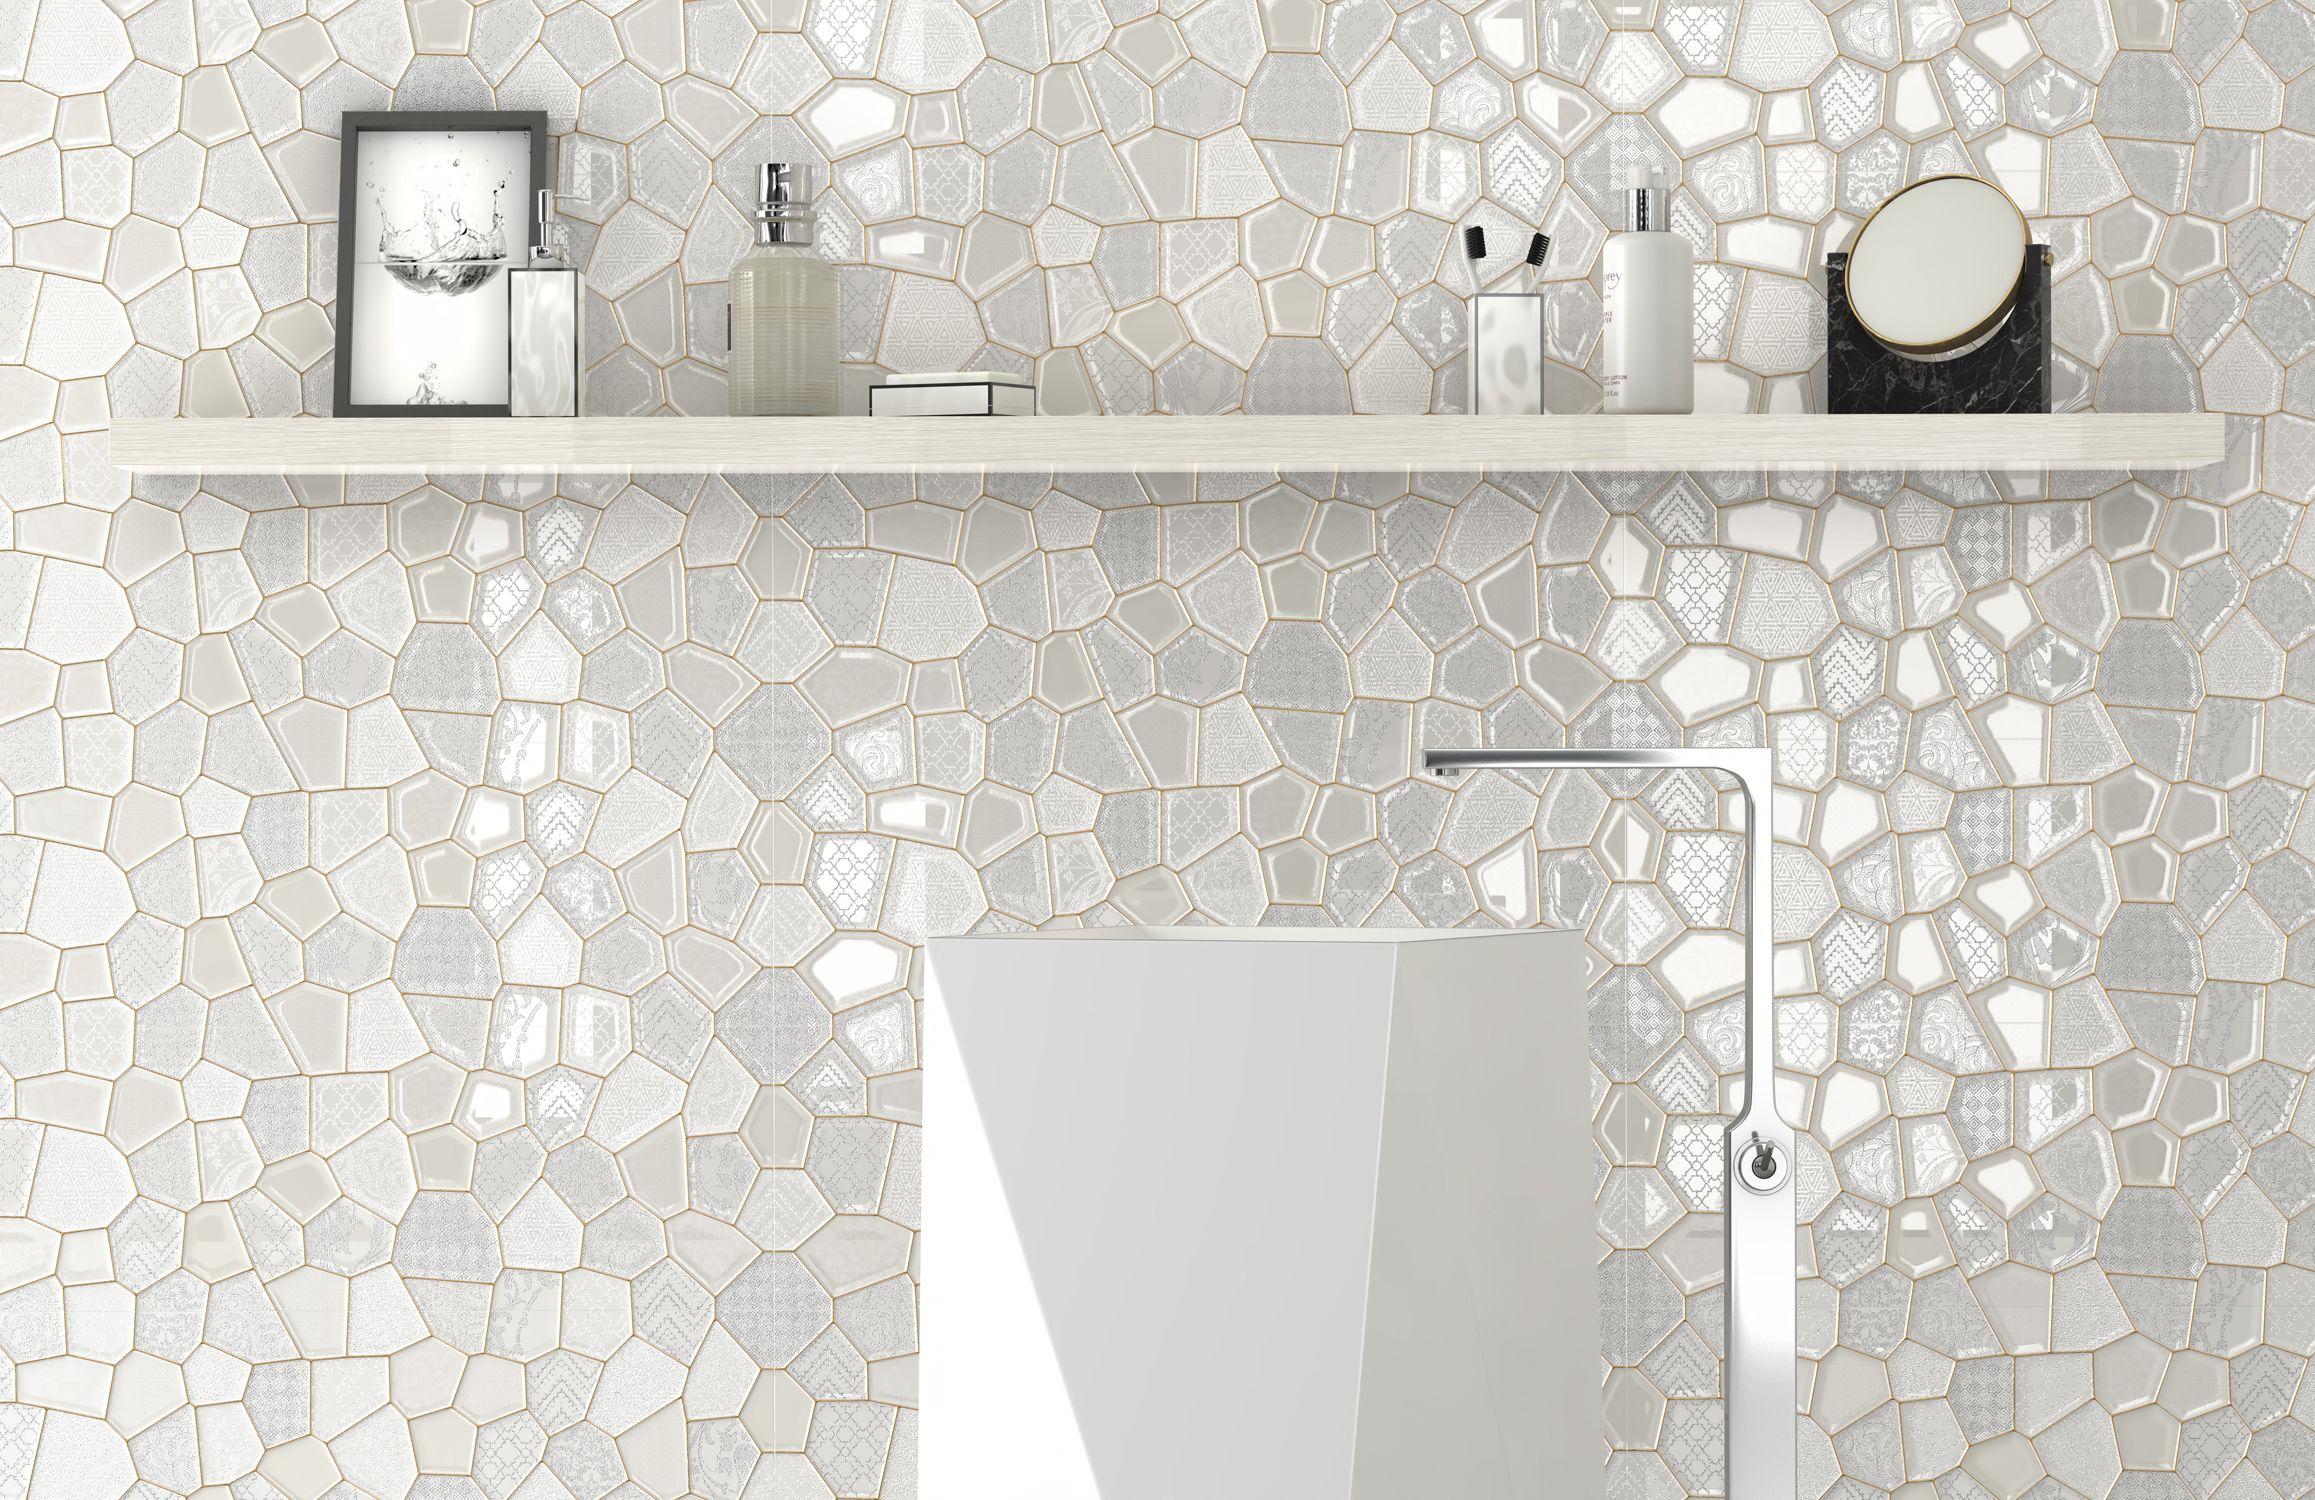 Dimensional Tile undefasa colorgloss/matt | dimensional tile, part of the tile of